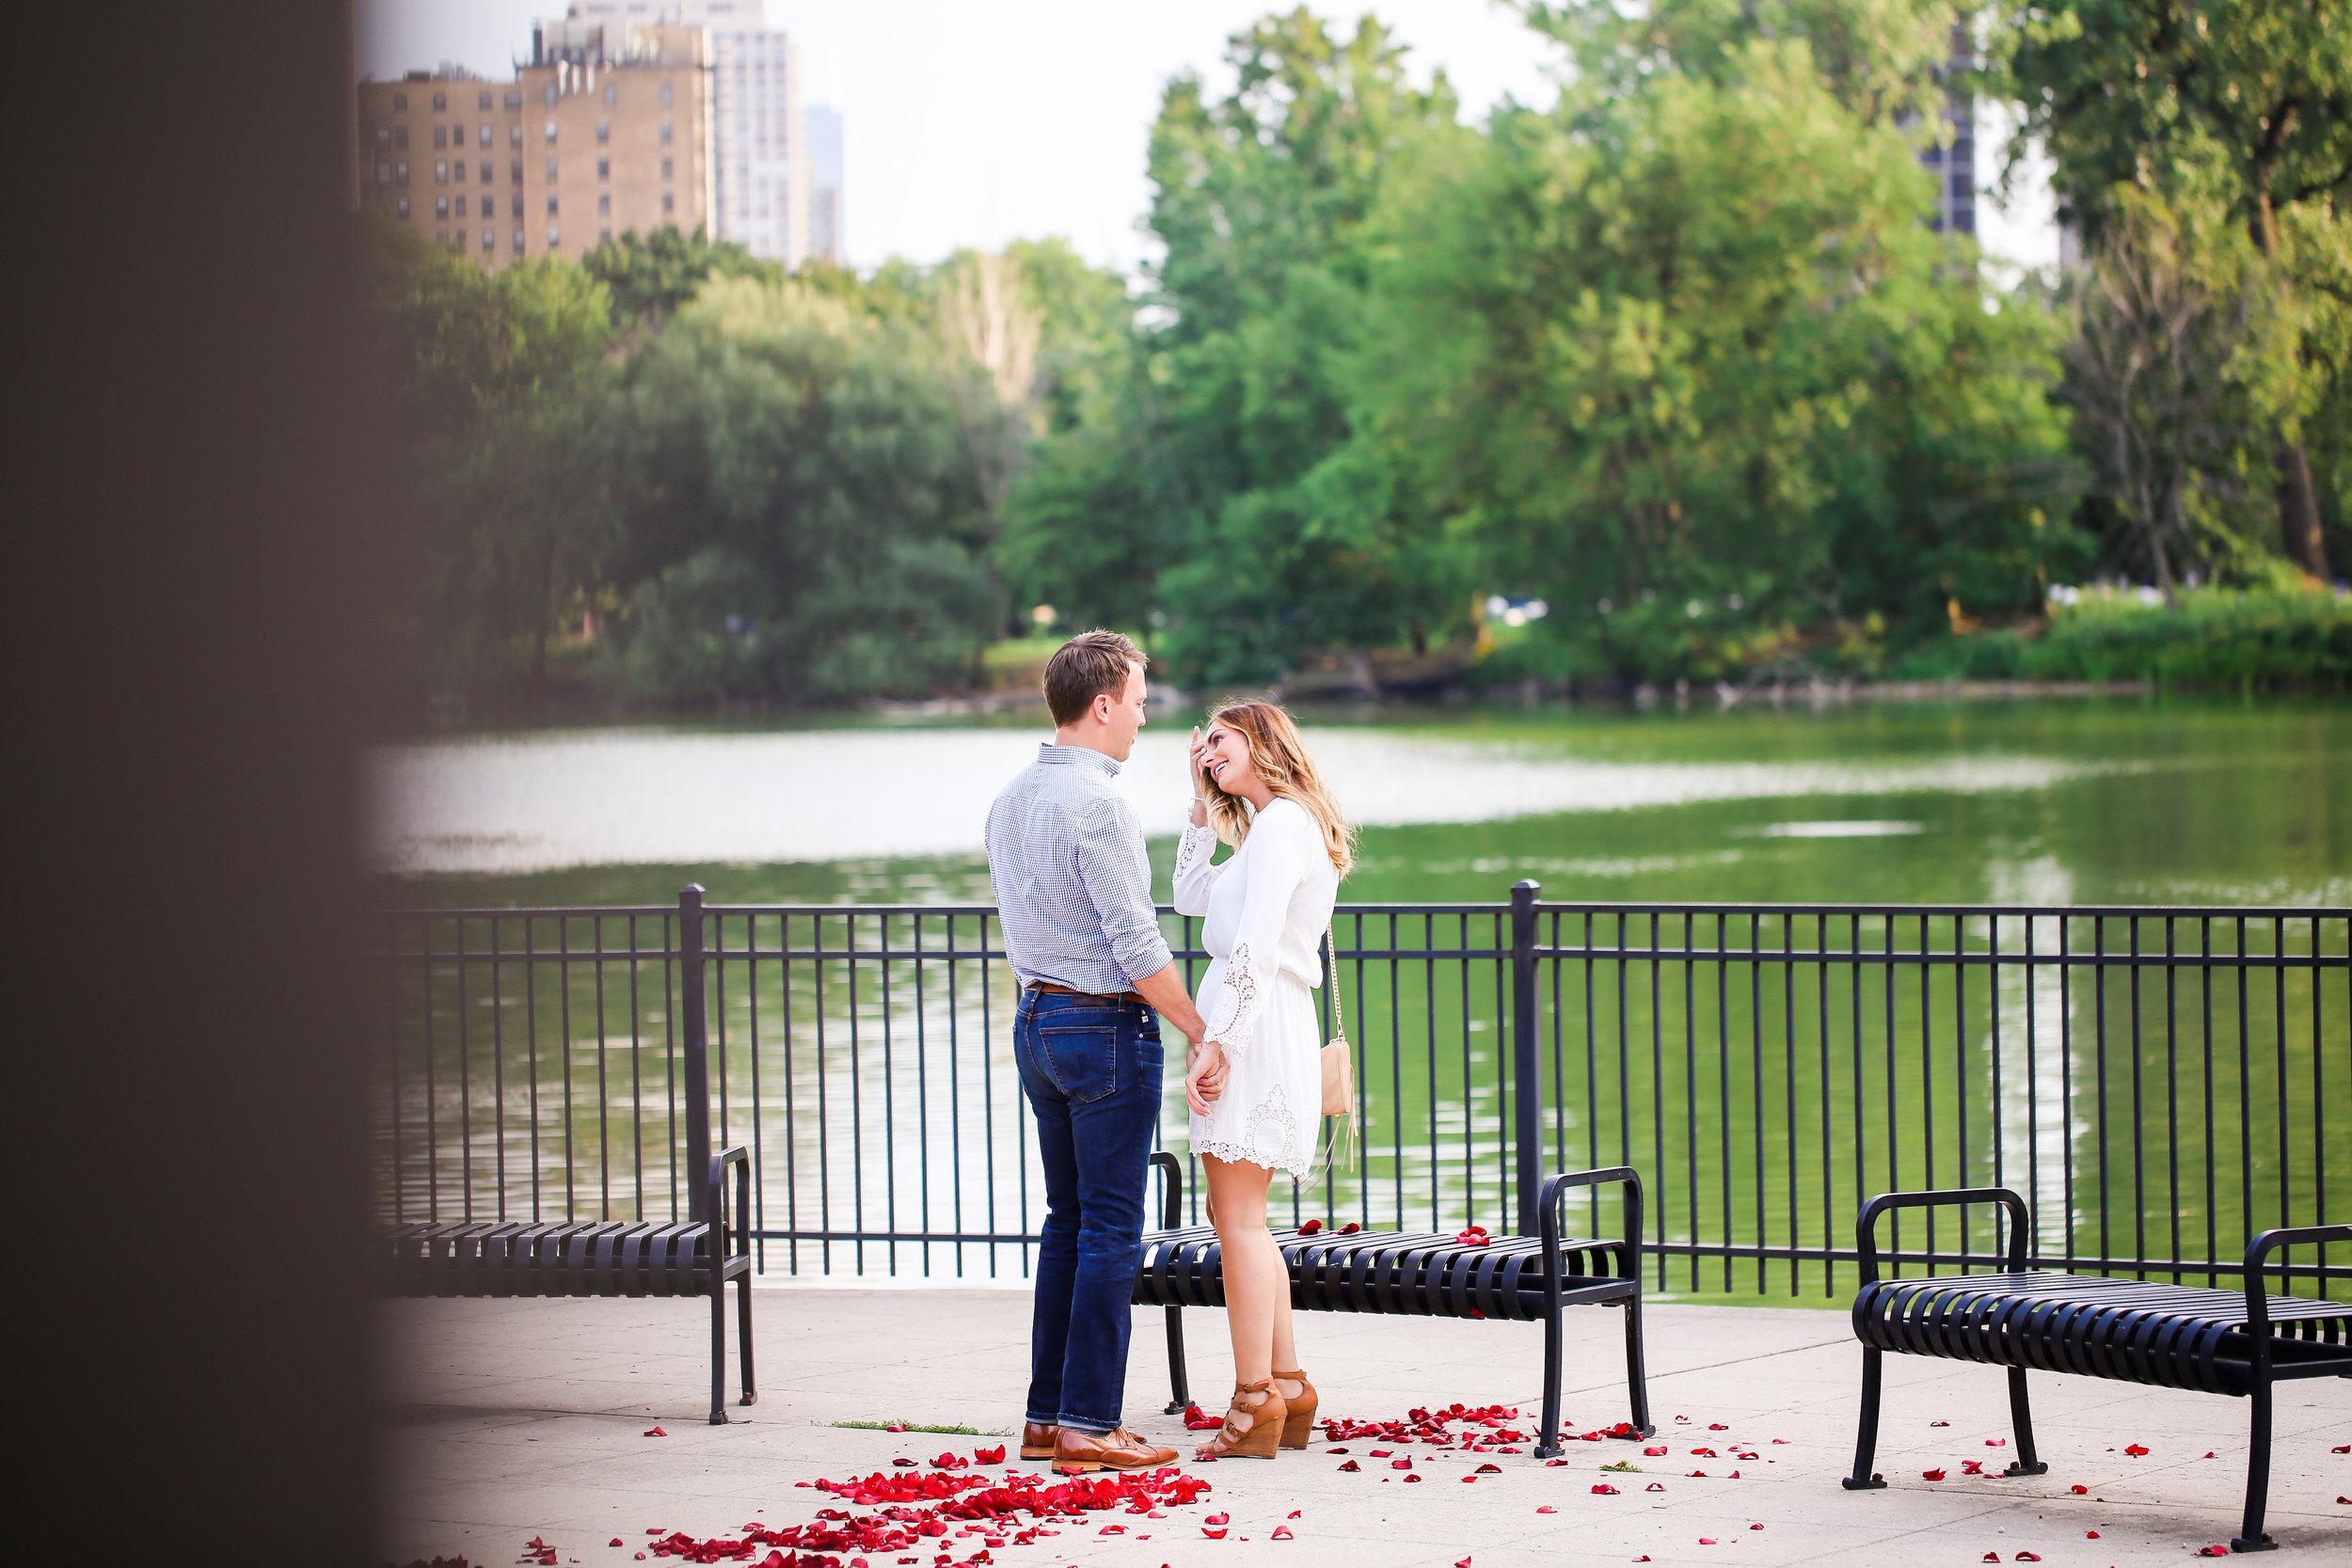 chicago proposal engagement session jenny grimm